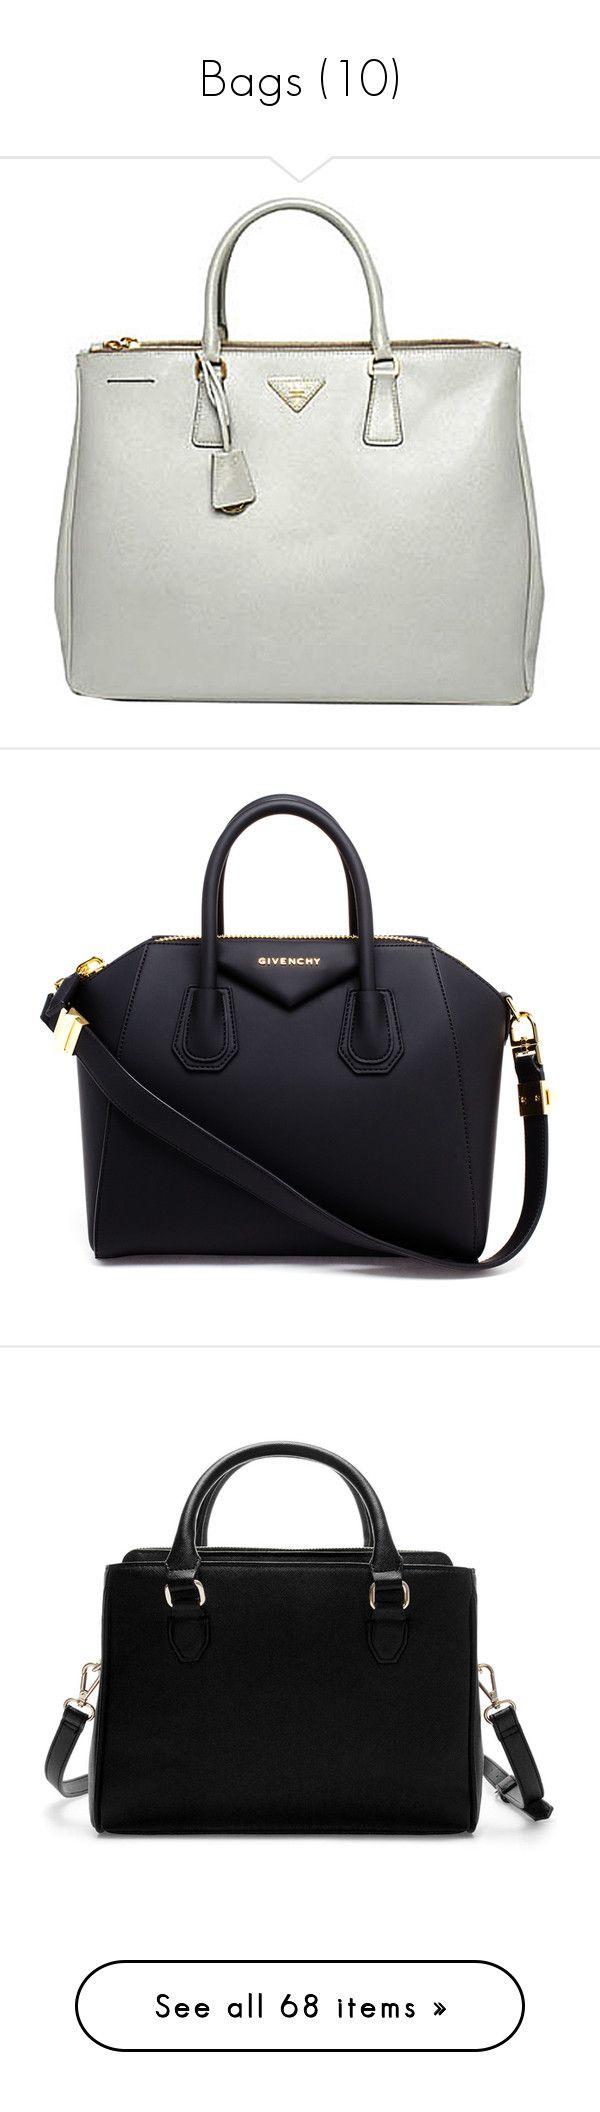 6b46a6c429680 Best 25+ Prada handbags ideas on Pinterest